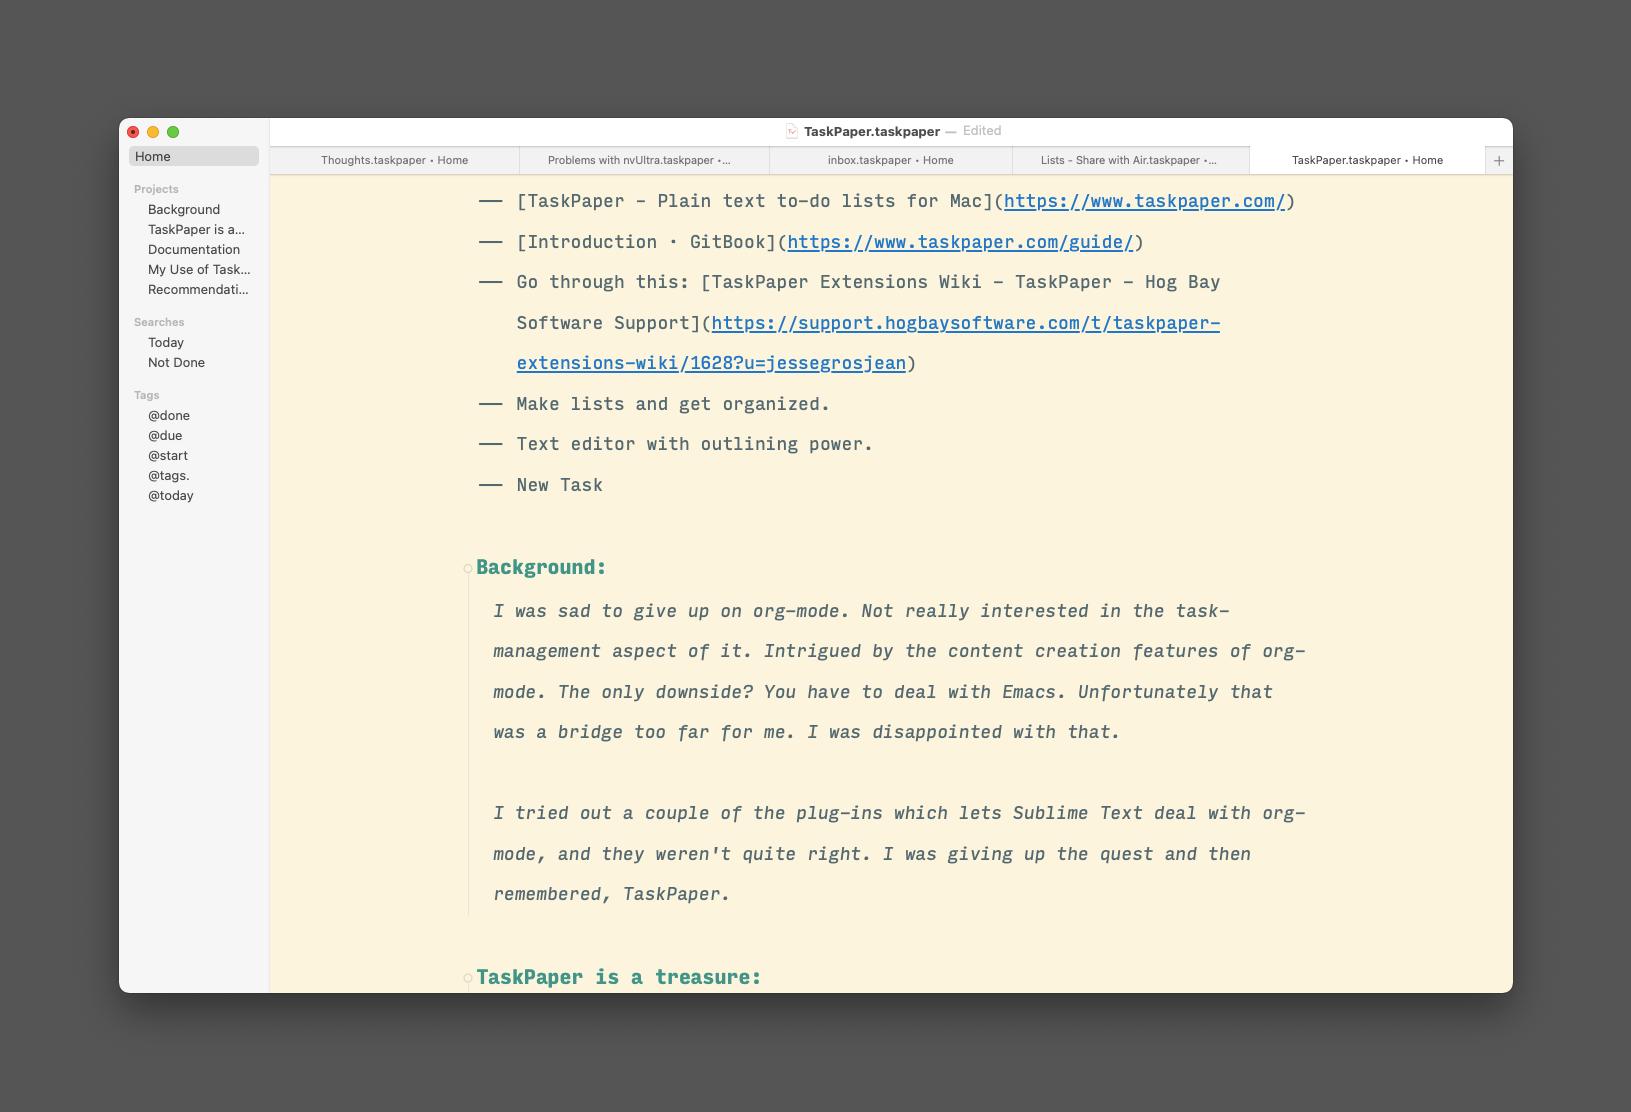 TaskPaper Window